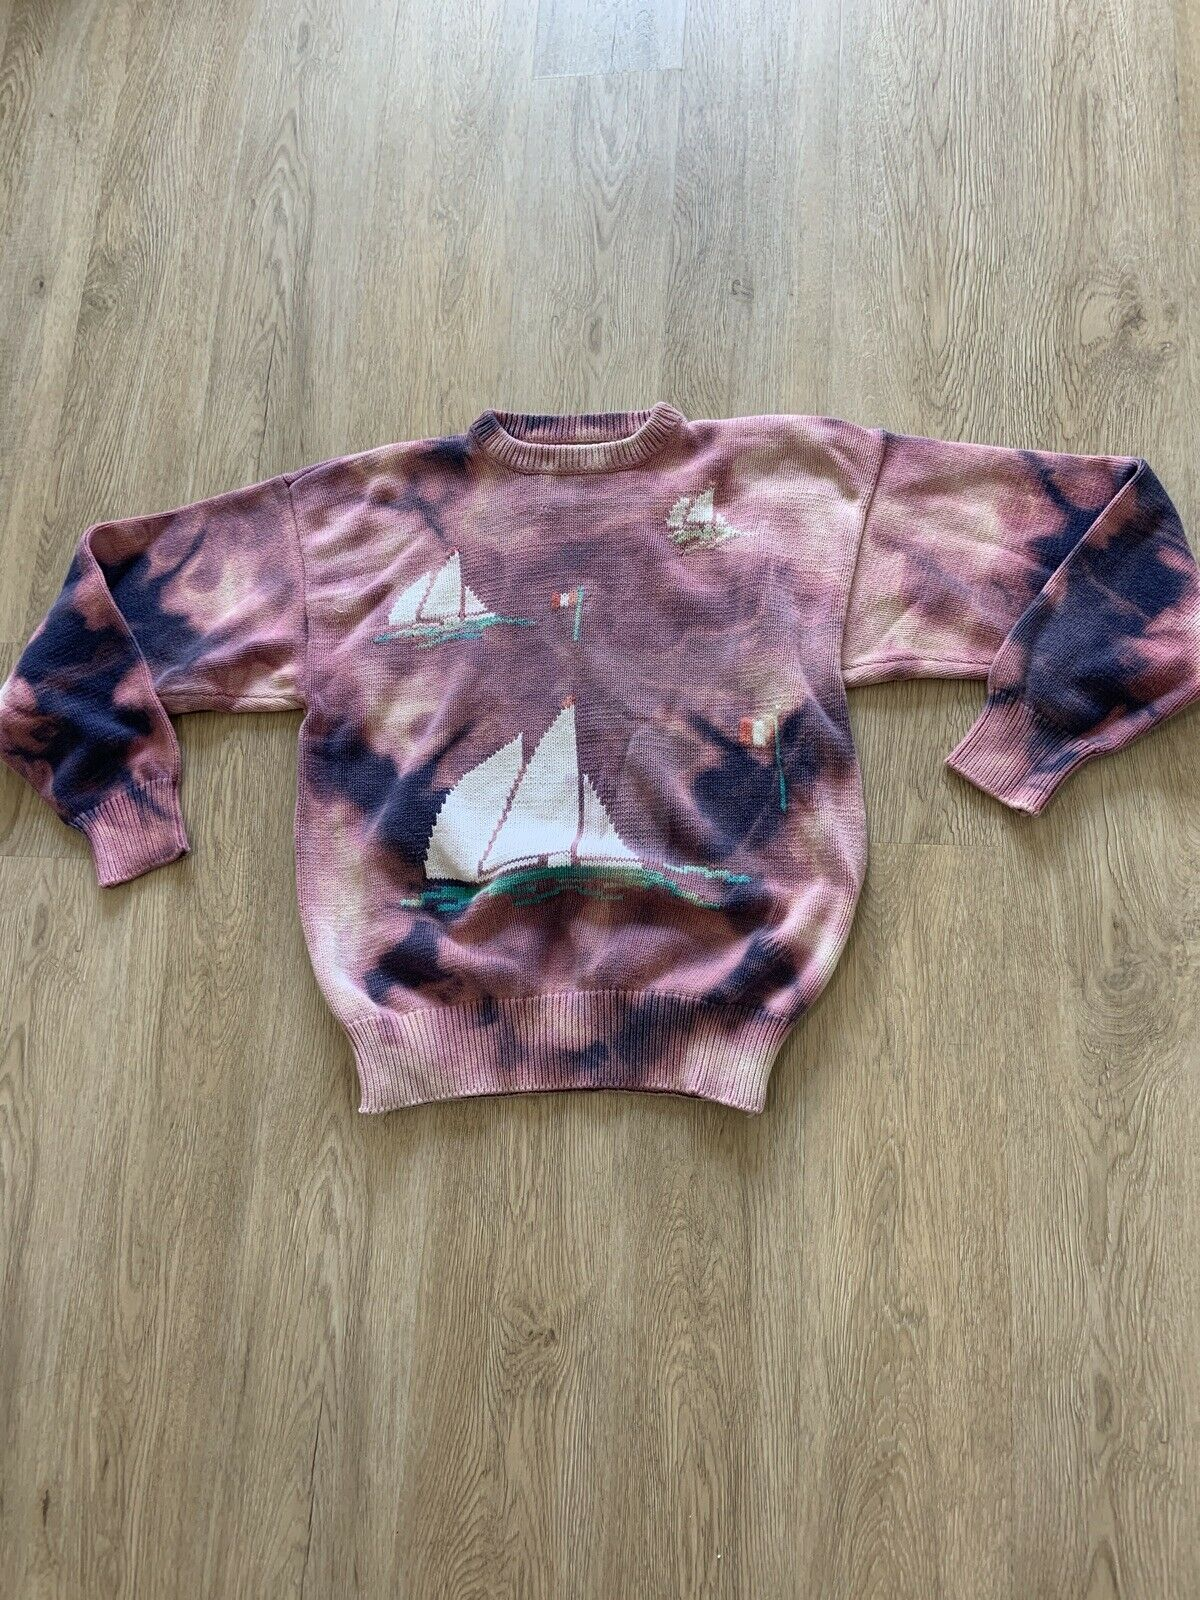 Tiedye Tie Dye Sweater VINTAGE - image 2